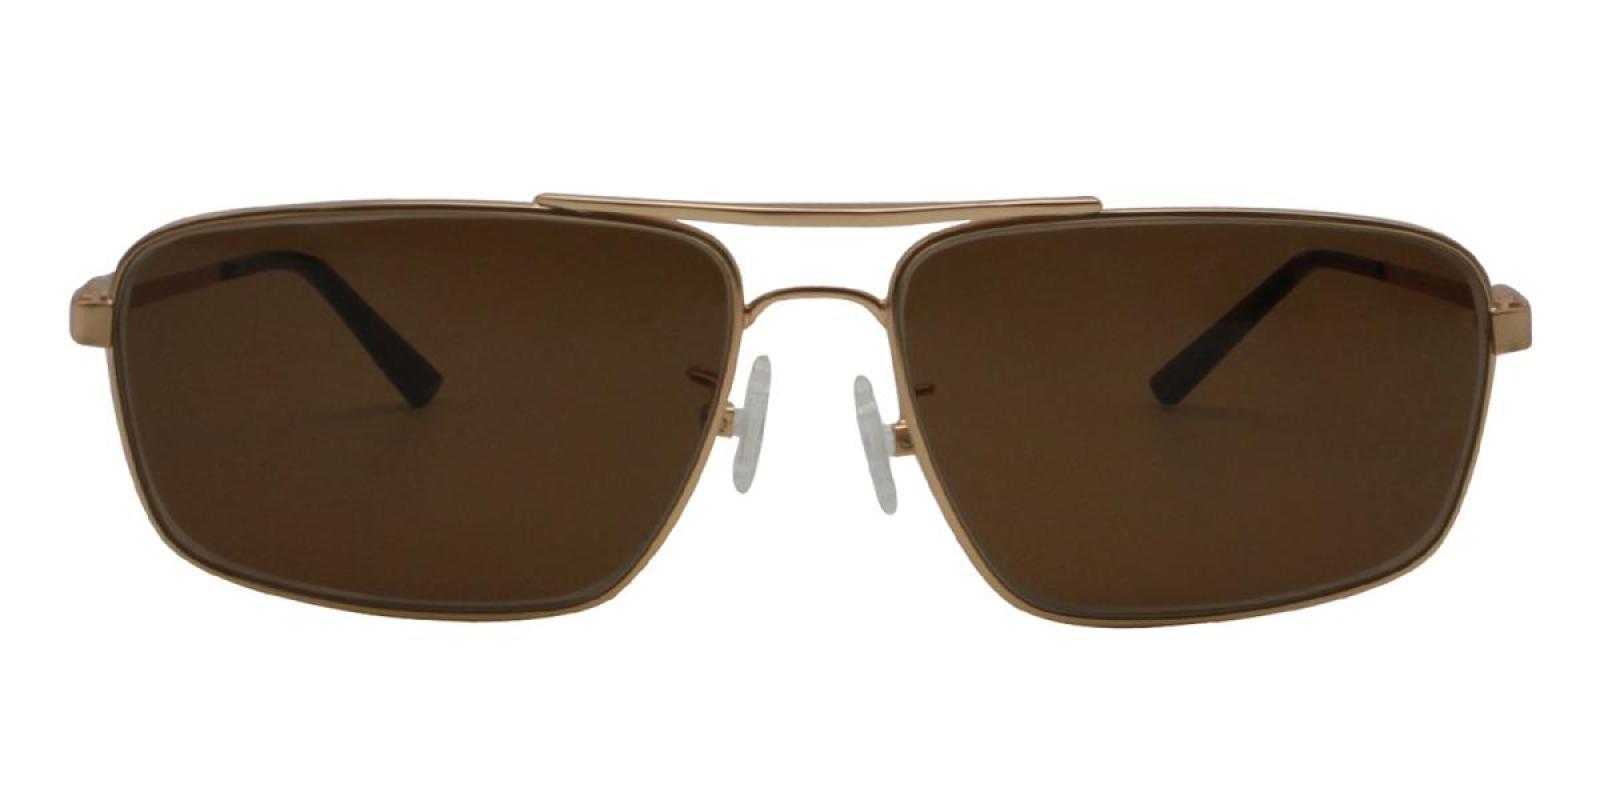 Santorini-Gold-Aviator-Metal-Sunglasses-additional2